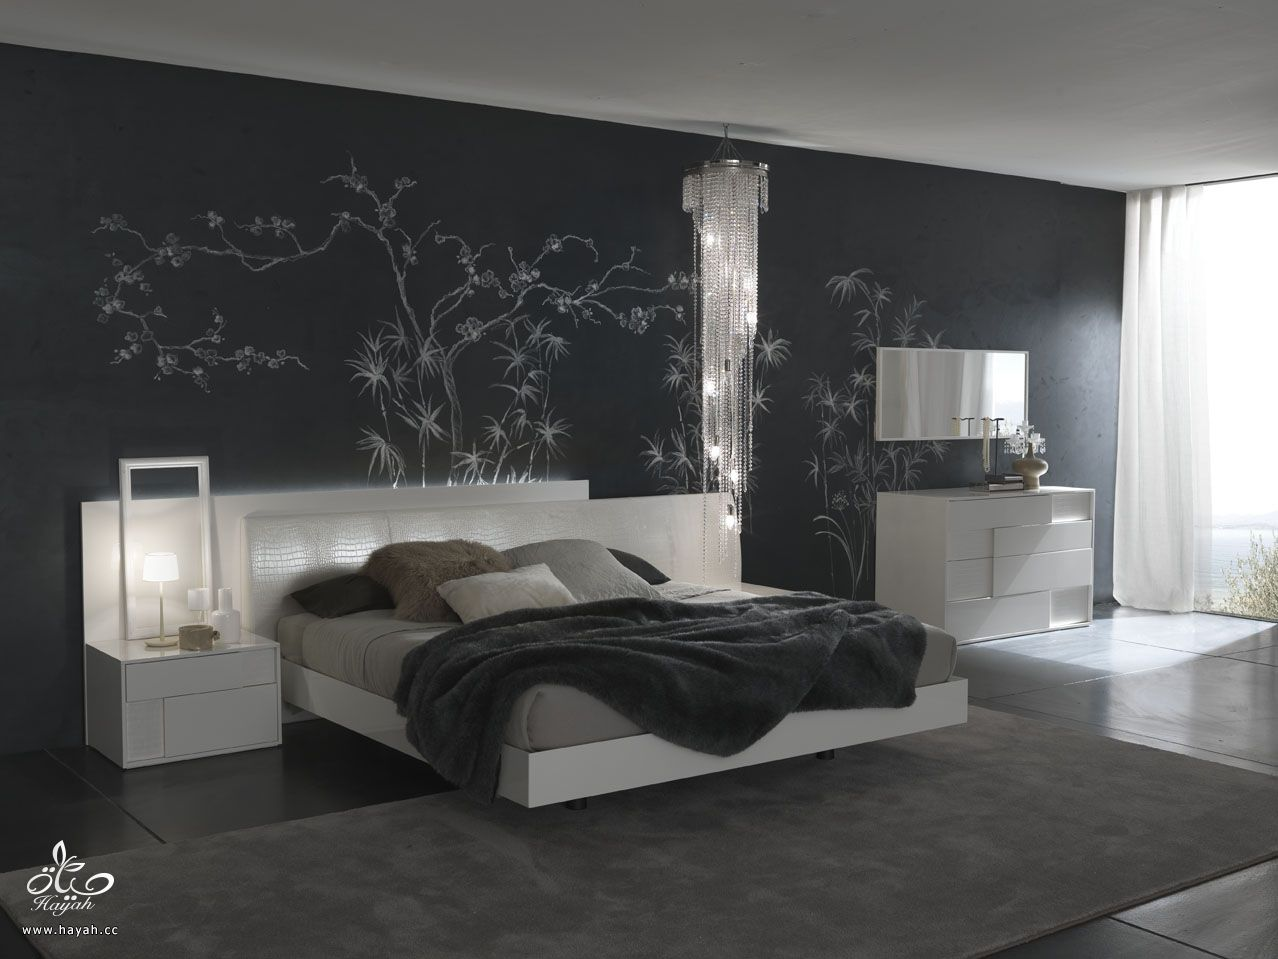 تصاميم غرف نوم ولا اجمل hayahcc_1367529965_556.jpg